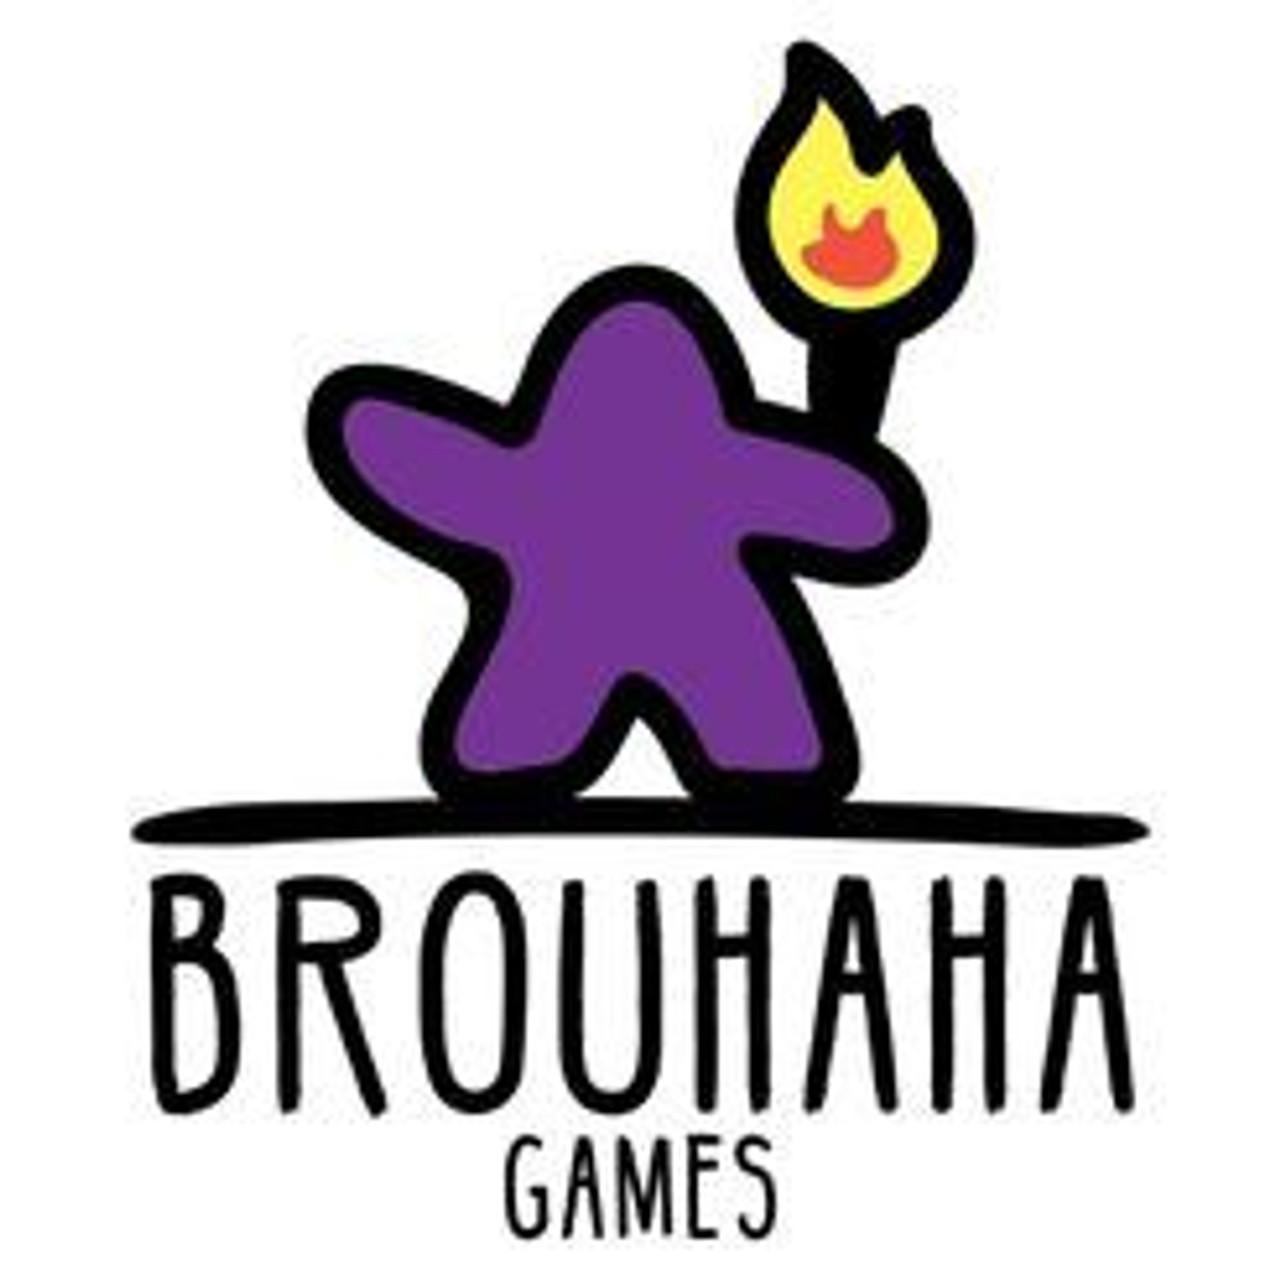 Brouhaha Games